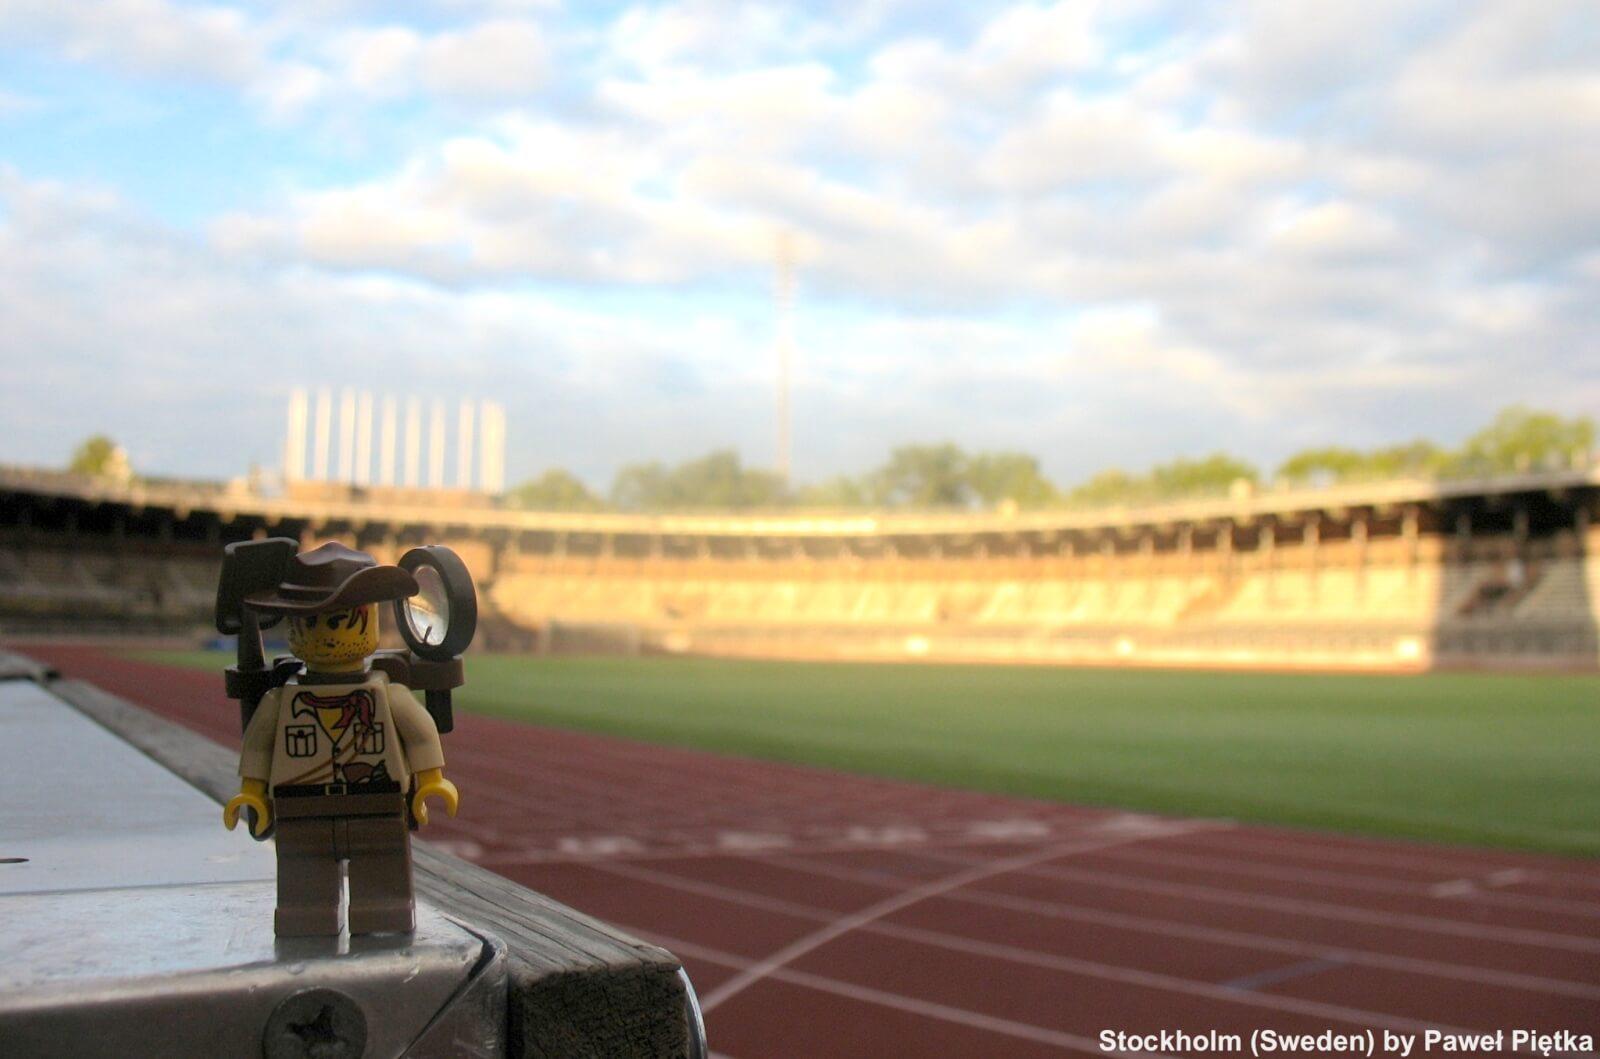 Stockholm (Sweden) - Olympic Stadium 1